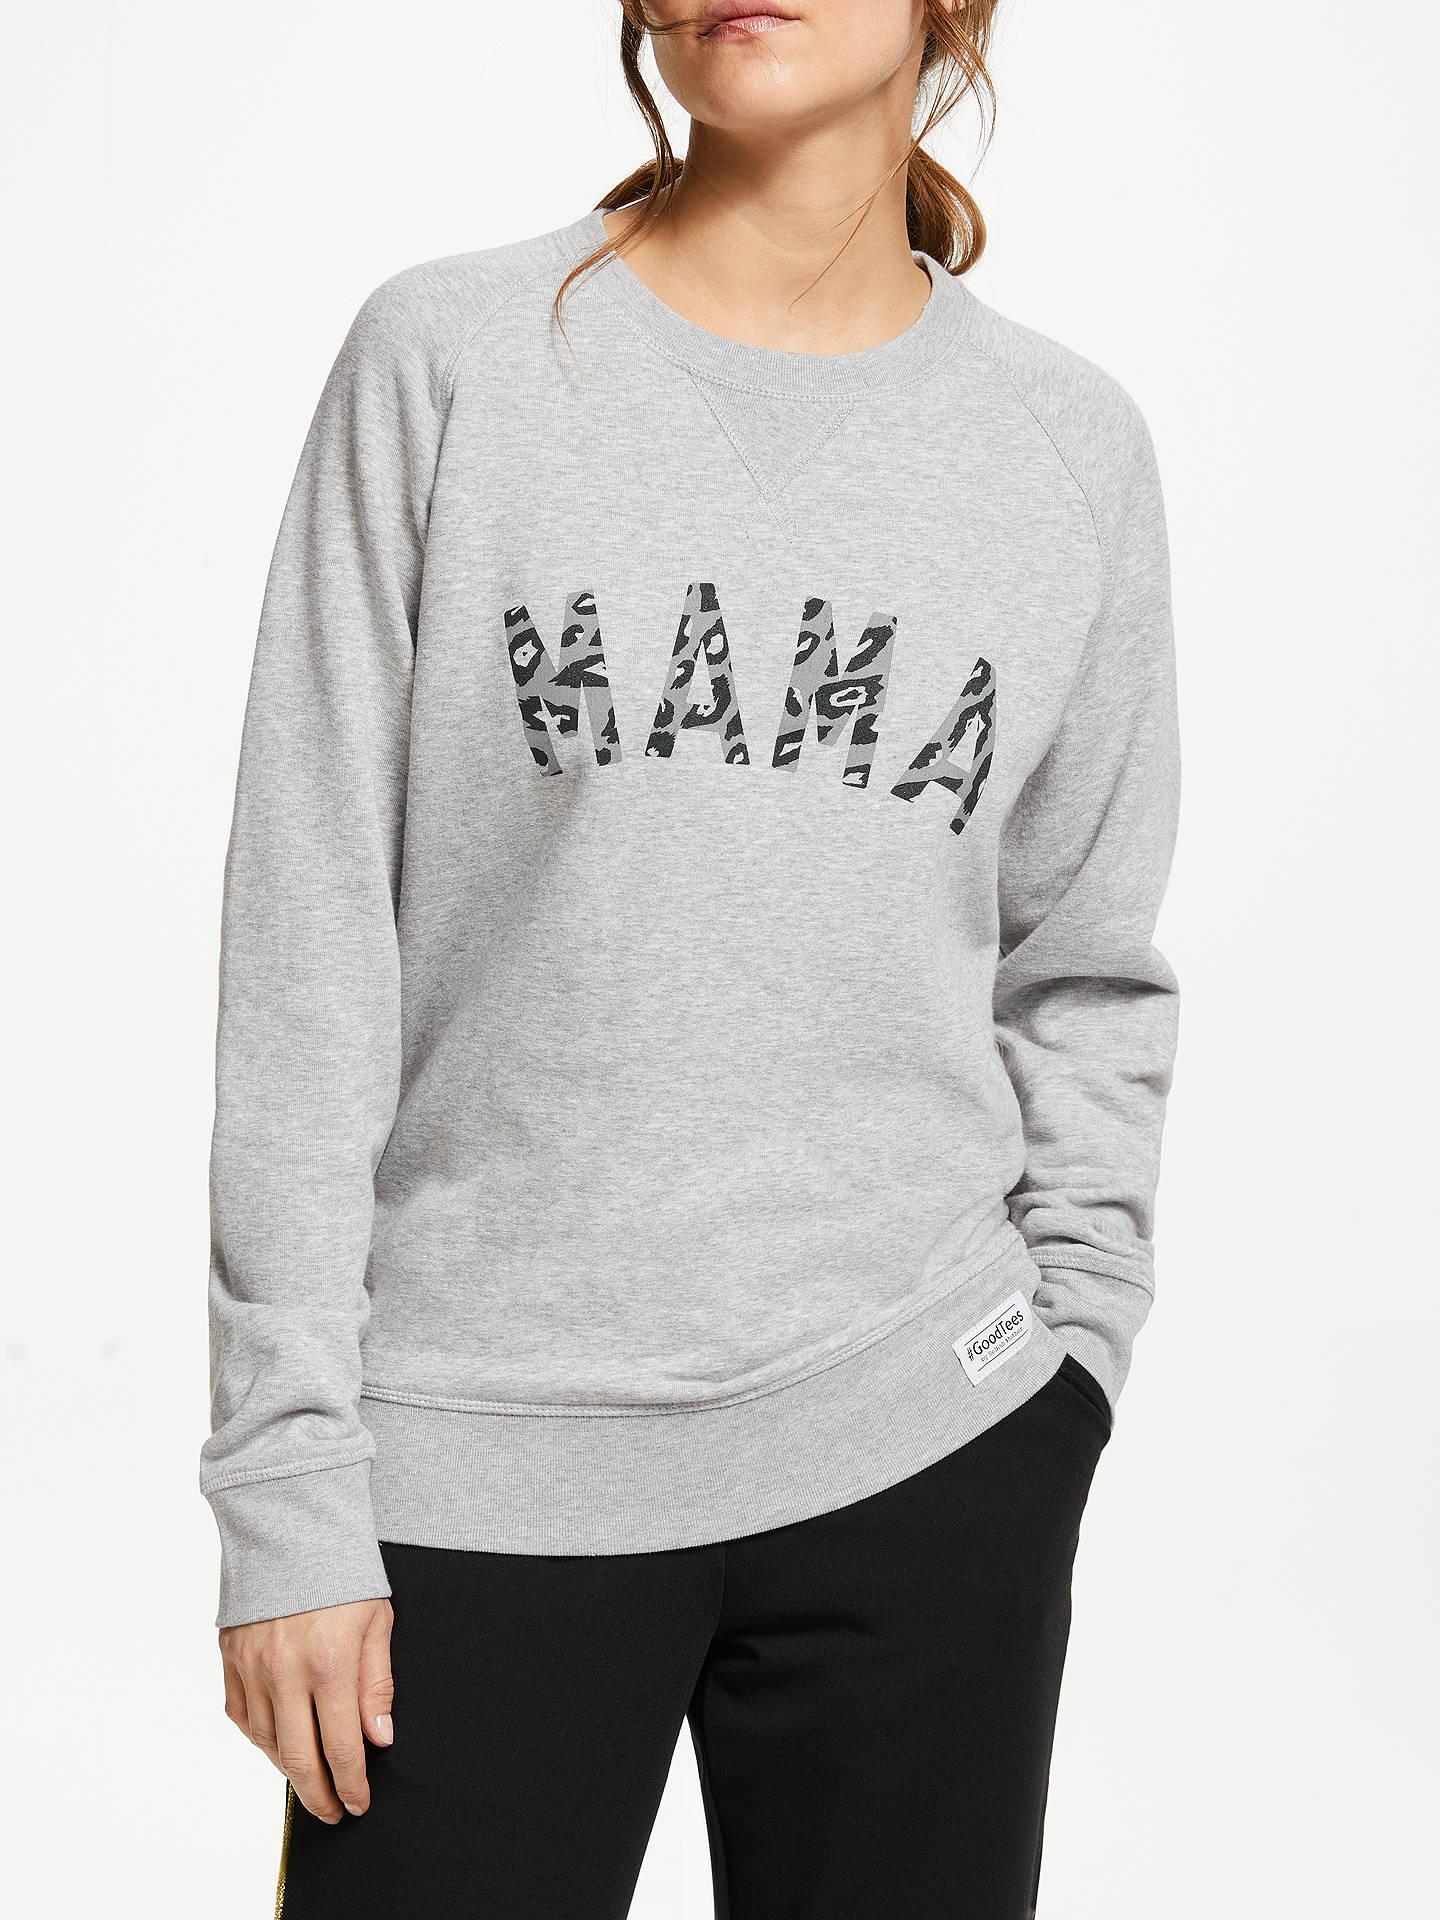 7f8f0906f6c4 Buy Selfish Mother Mama Leopard Crew Neck Sweatshirt, Grey, S Online at  johnlewis.